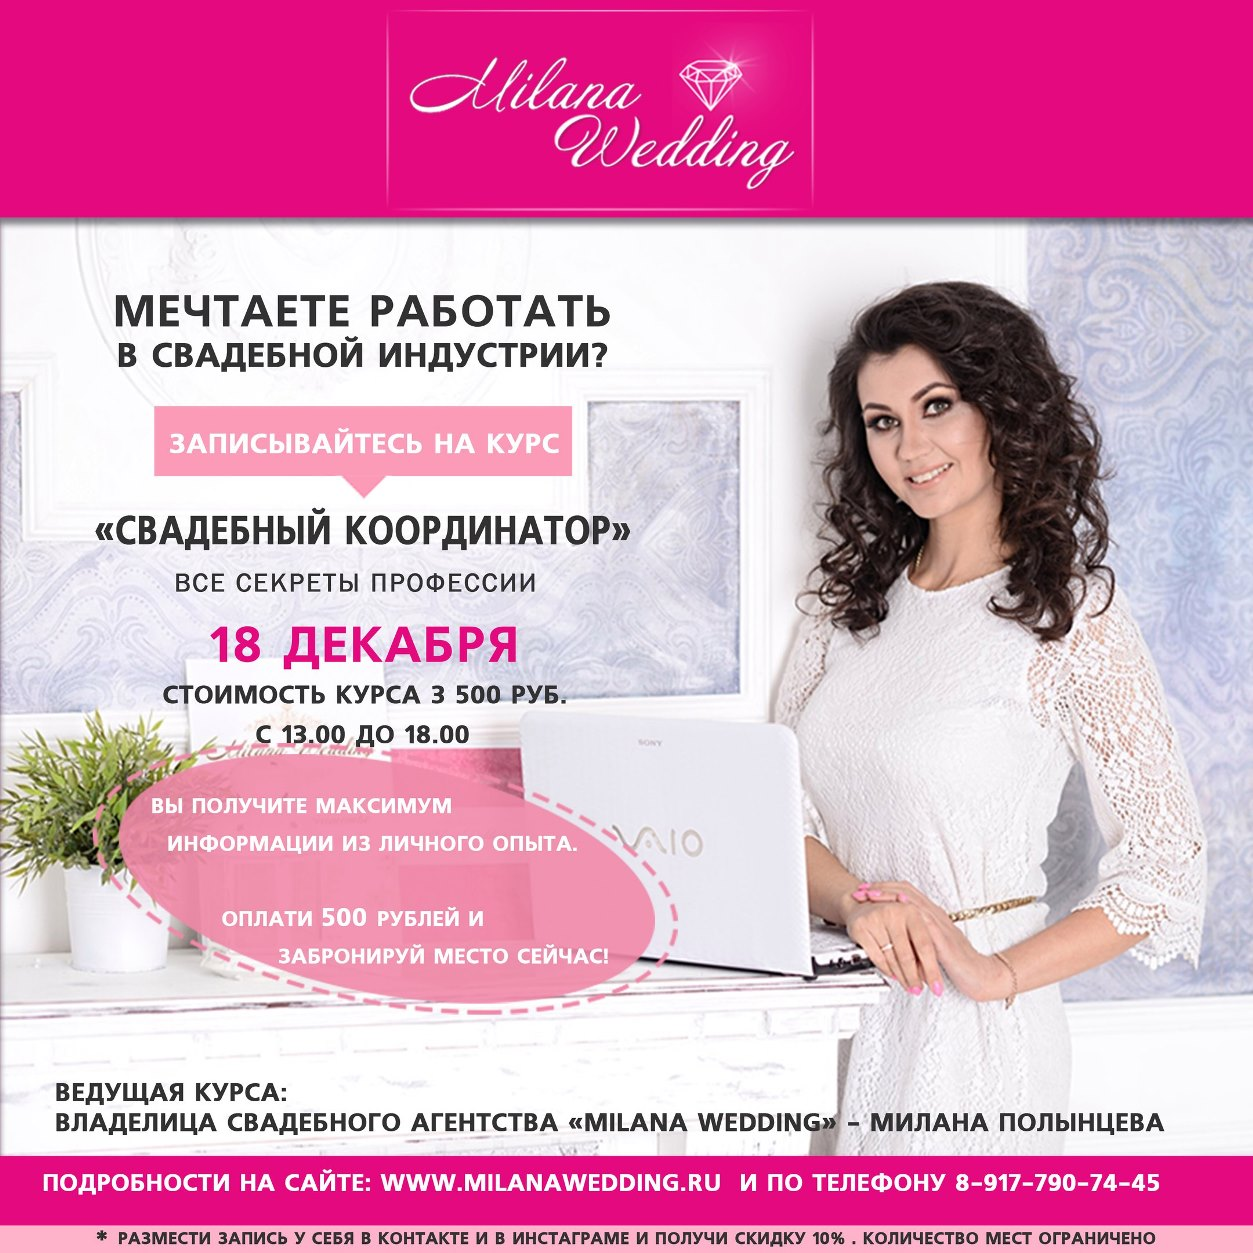 kurs-svadebnyj-koordinator-18-dekabrya